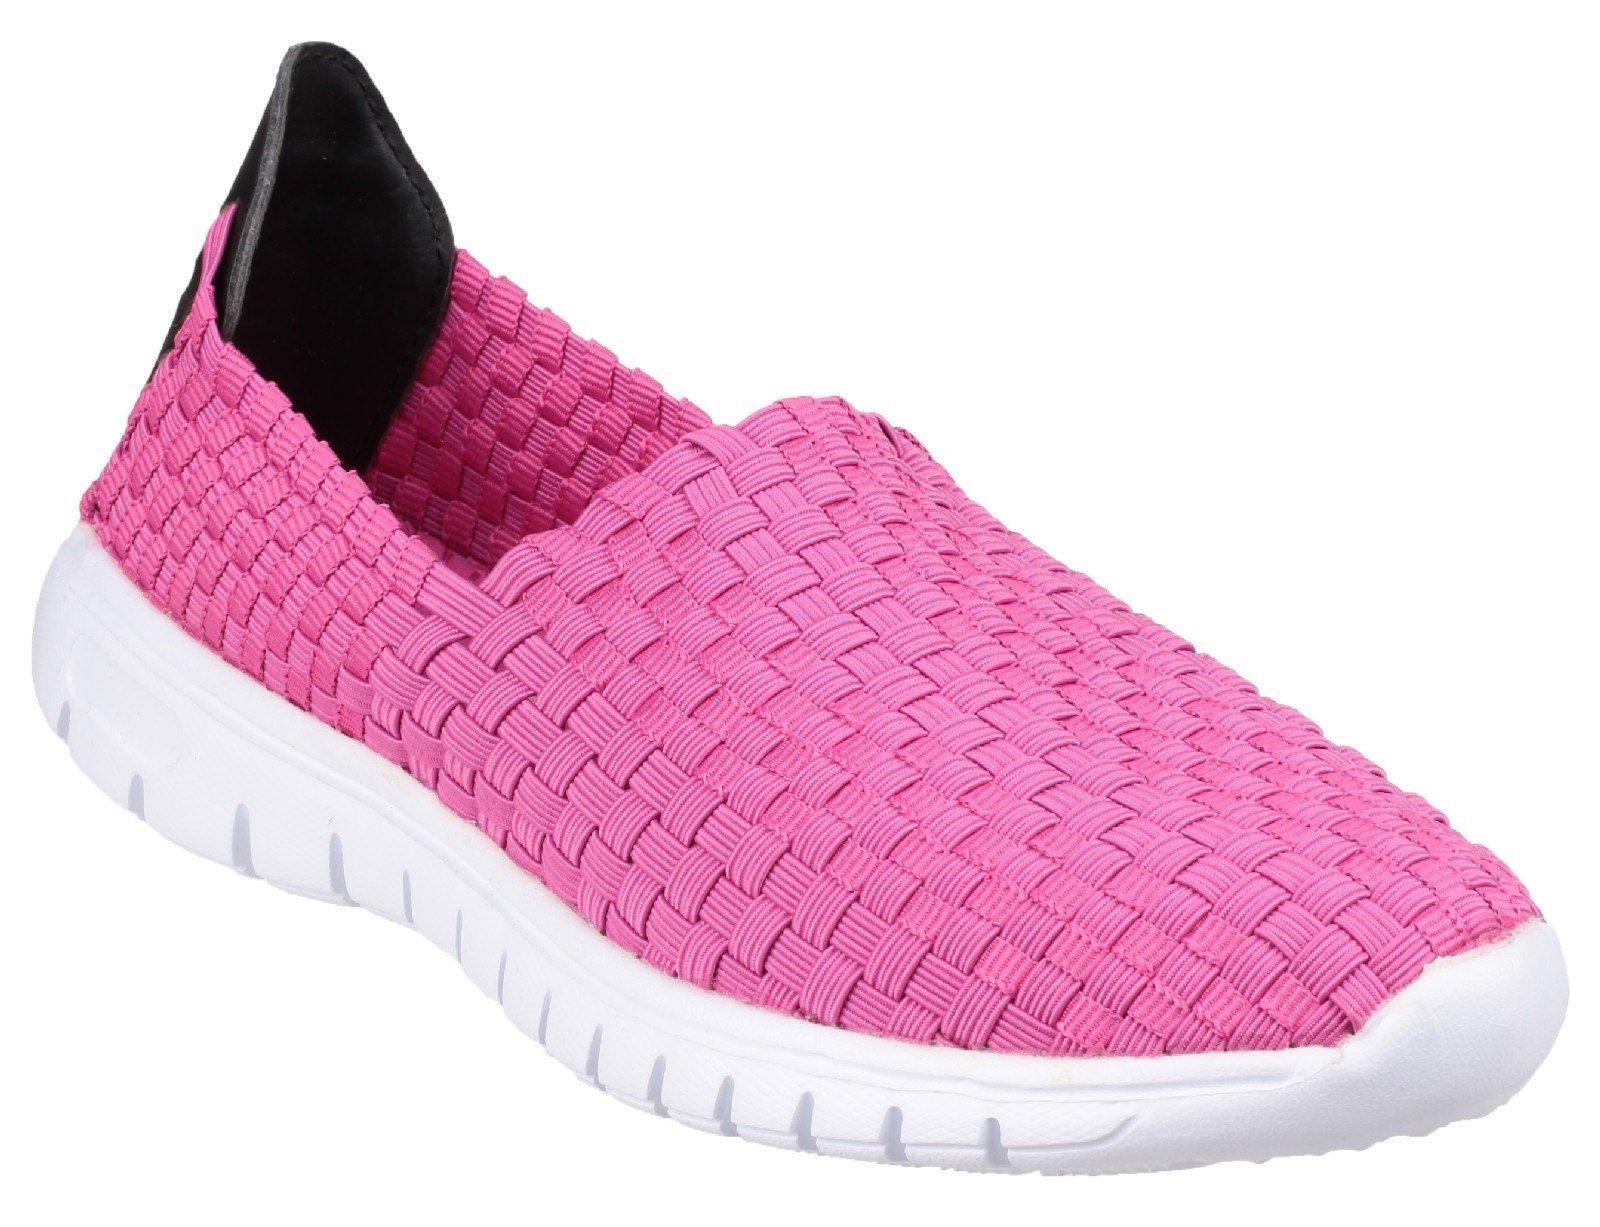 Divaz Women's Raft Shoes Fuchsia 22115-35769 - Fuchsia 3